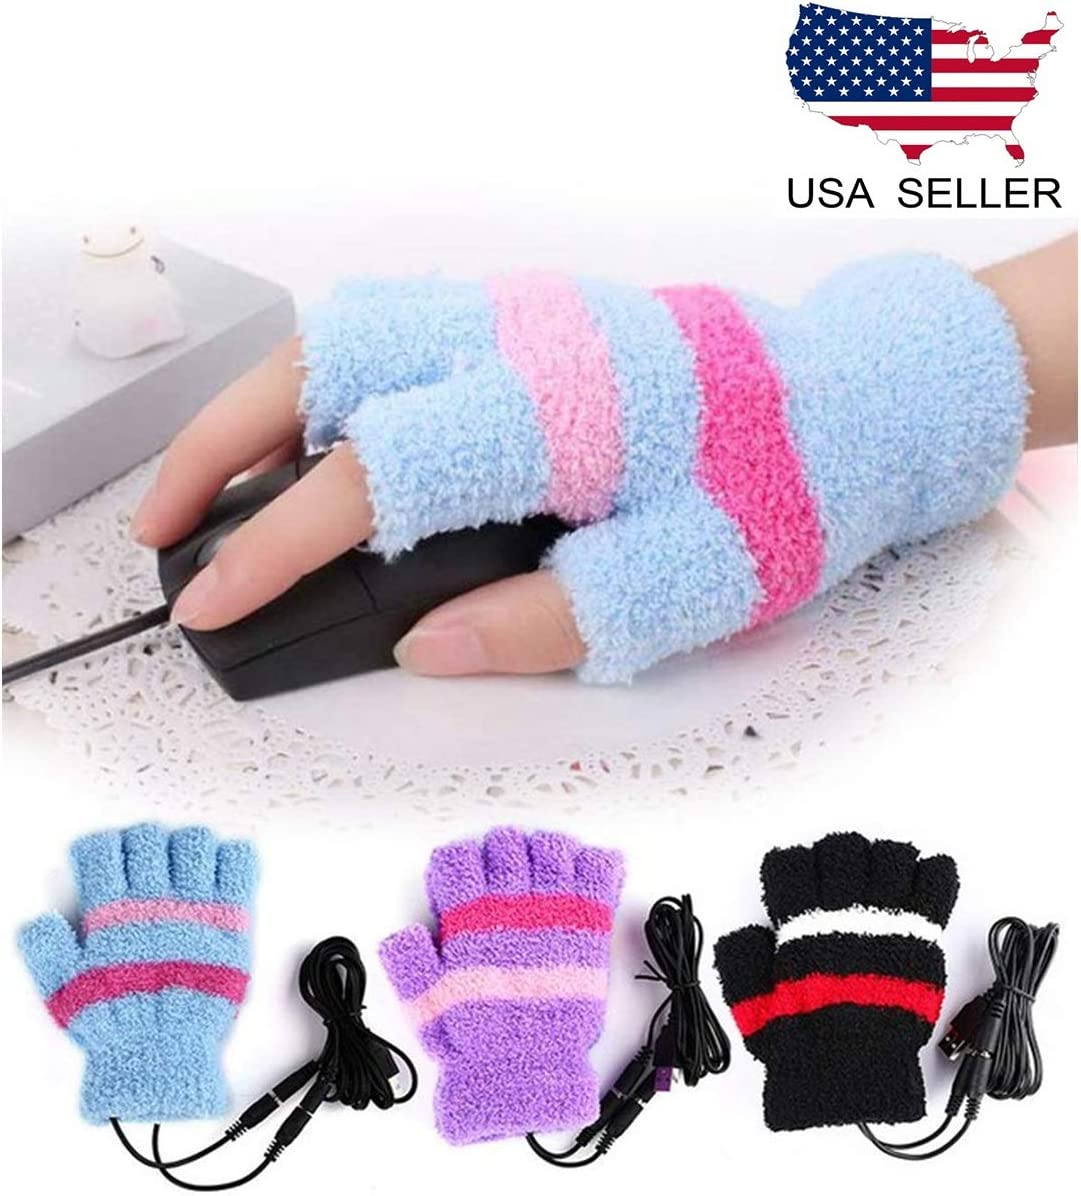 HoFire USB Heating Winter Gloves Women Hand Warm Gloves USB Heater Fingerless Warmer Mitten Gloves